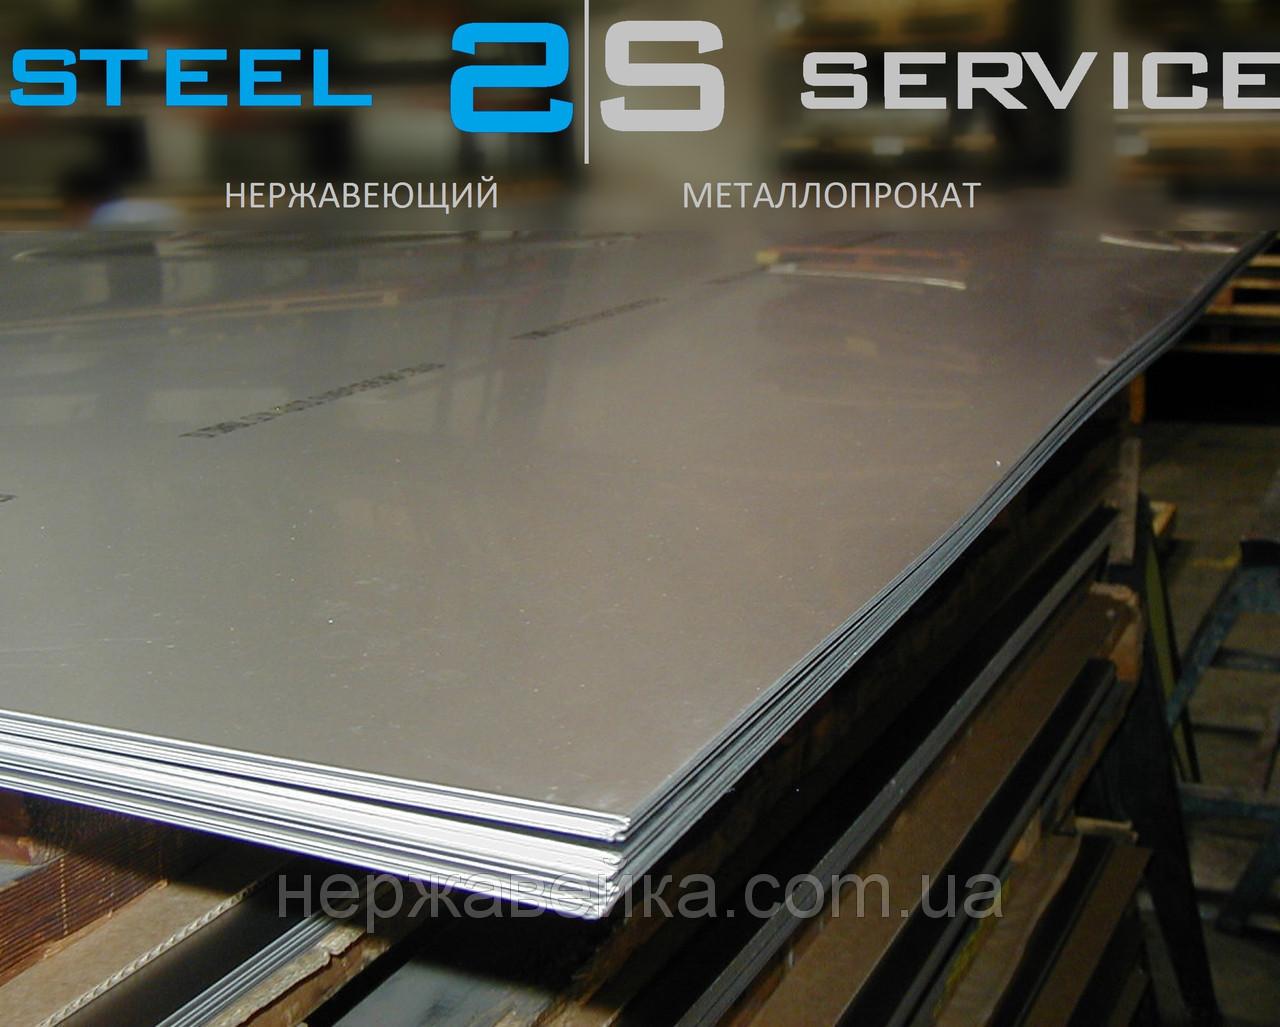 Нержавейка лист 10х1250х2500мм AISI 430(12Х17) 2B - матовый, технический